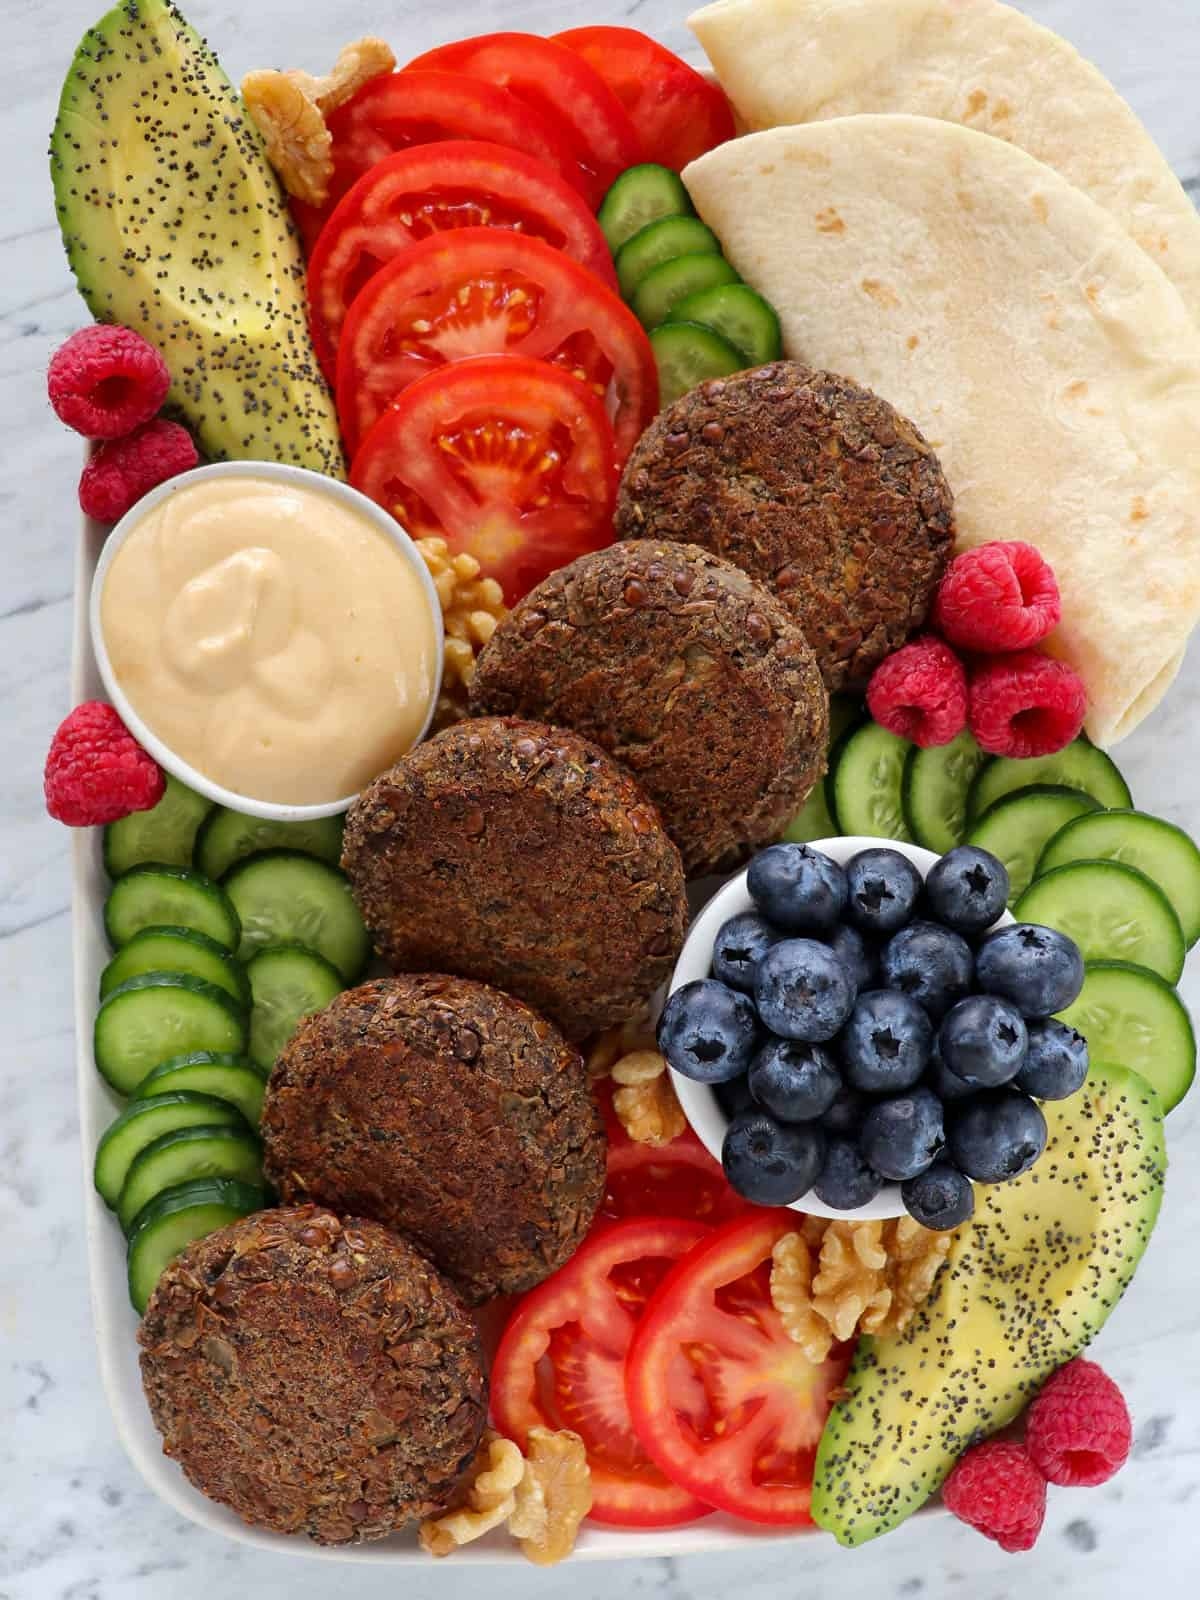 Breakfast platter with the vegan sausage patties.